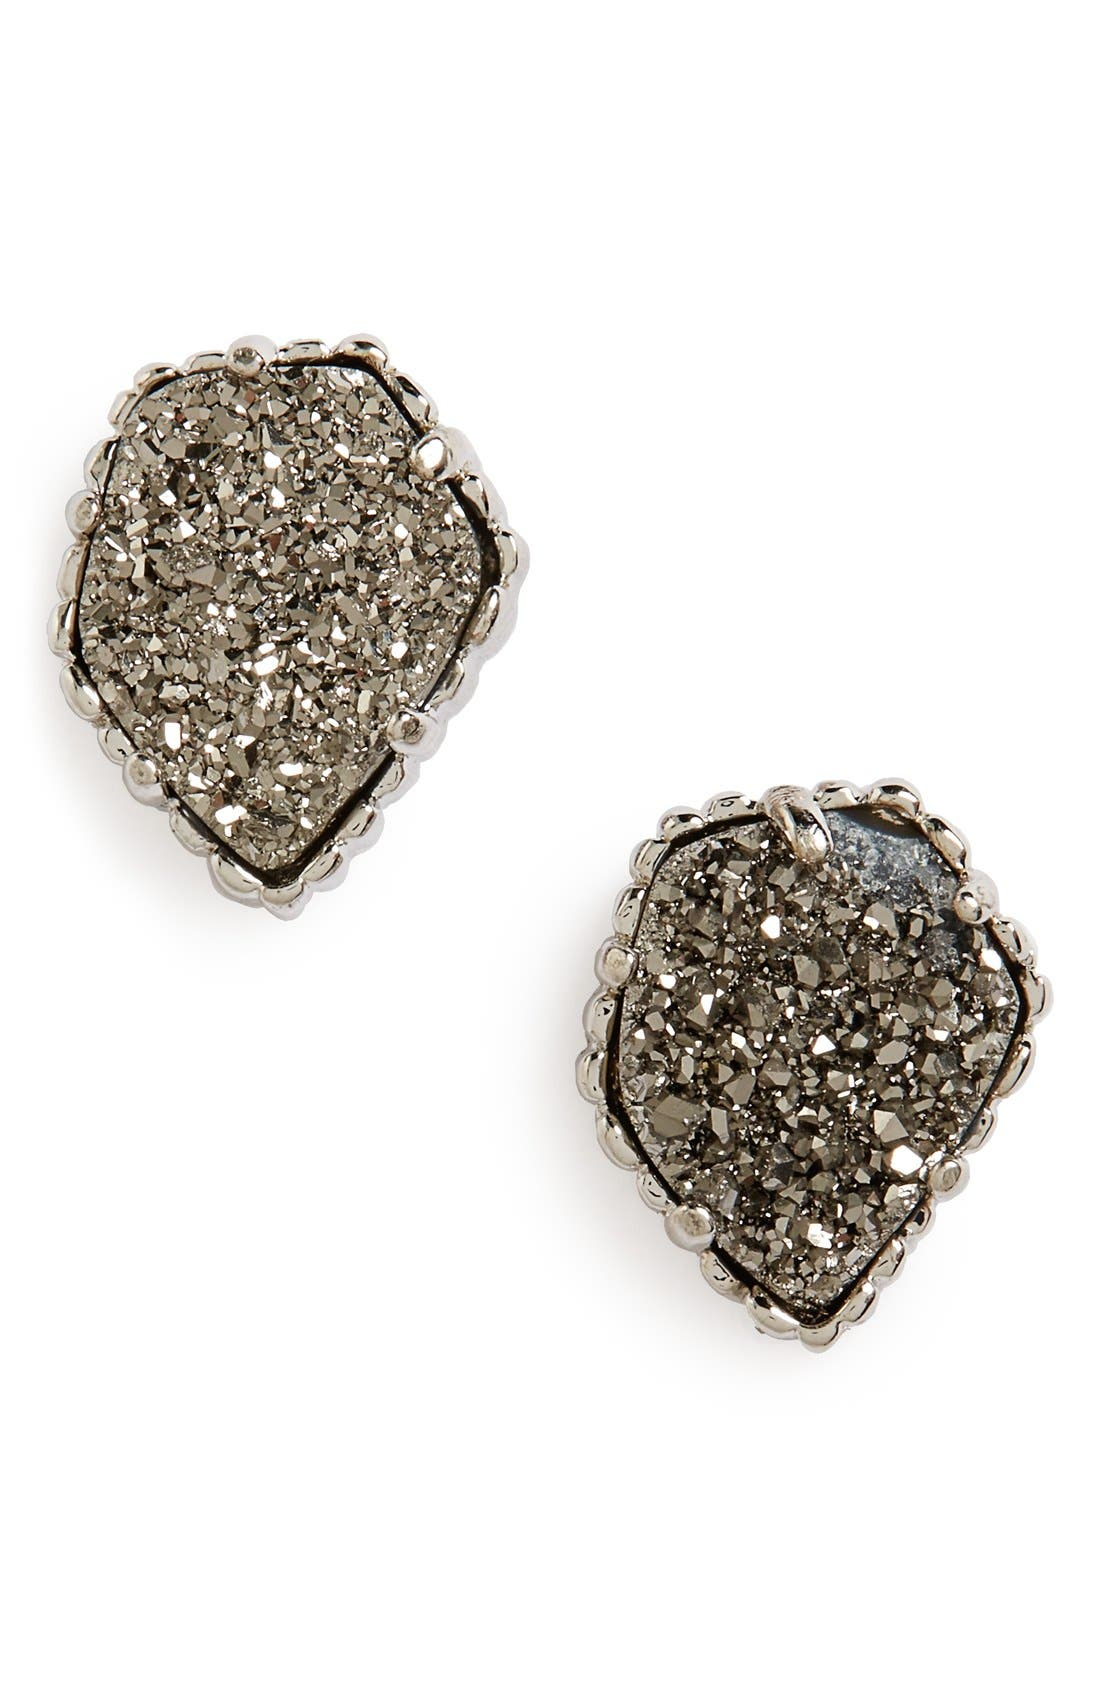 Main Image - Kendra Scott Tessa Stone Stud Earrings